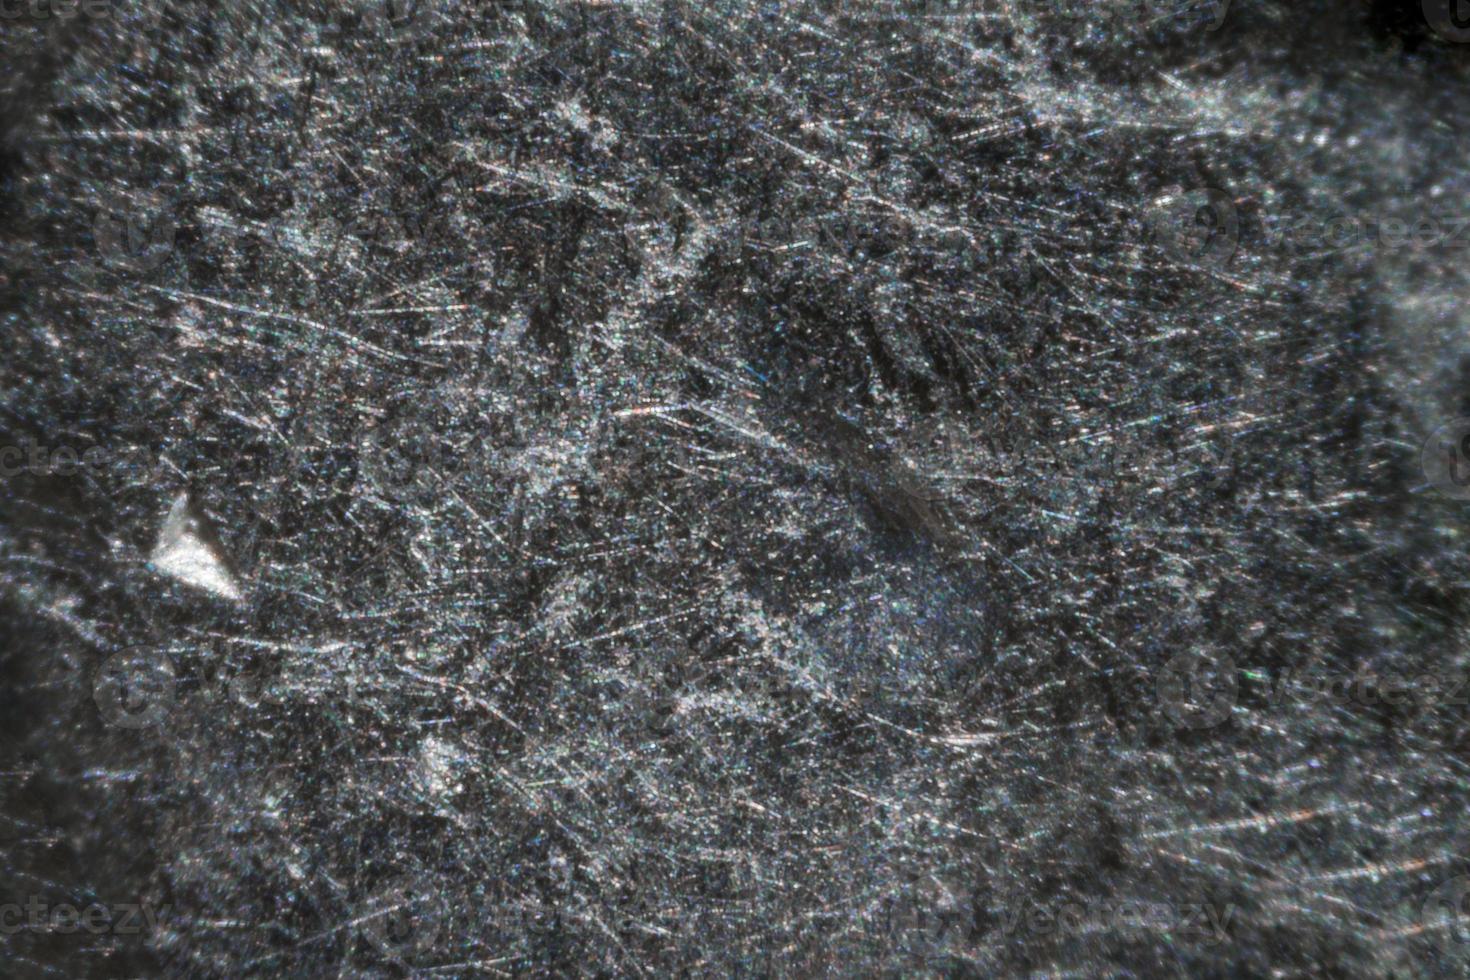 moneta israeliana da 1 siclo al microscopio foto